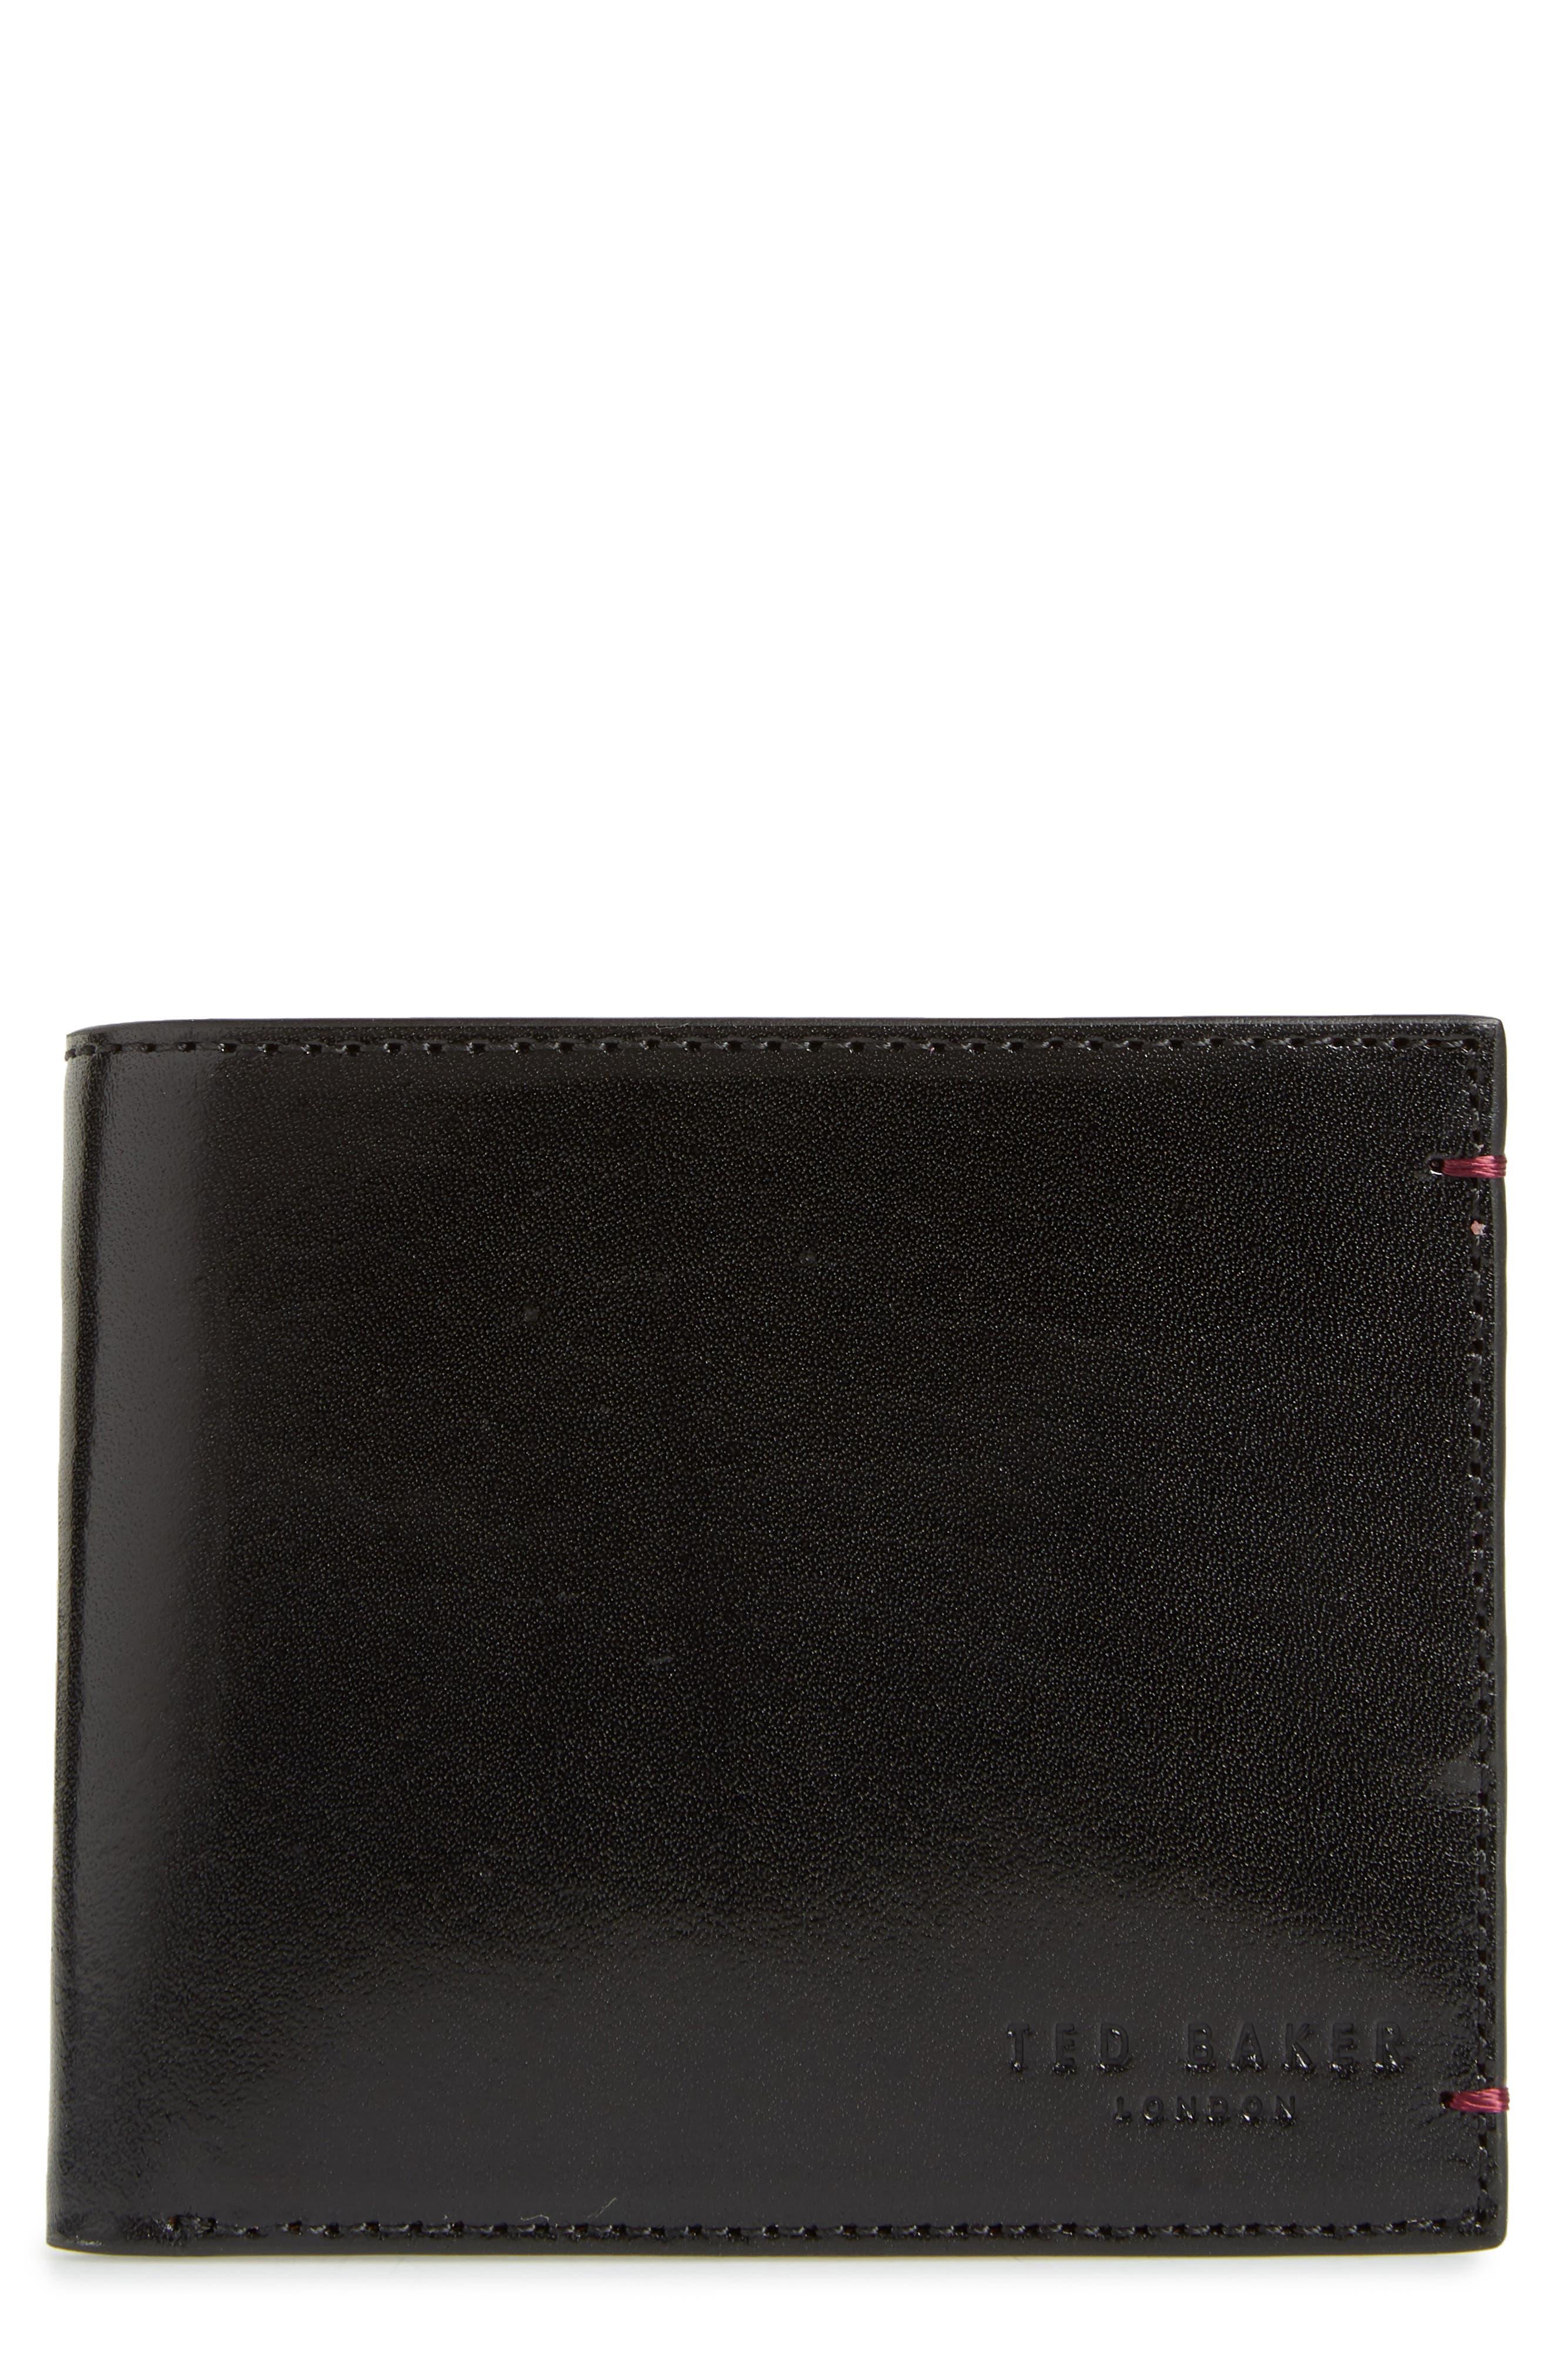 TED BAKER LONDON Contrast Leather Wallet, Main, color, BLACK